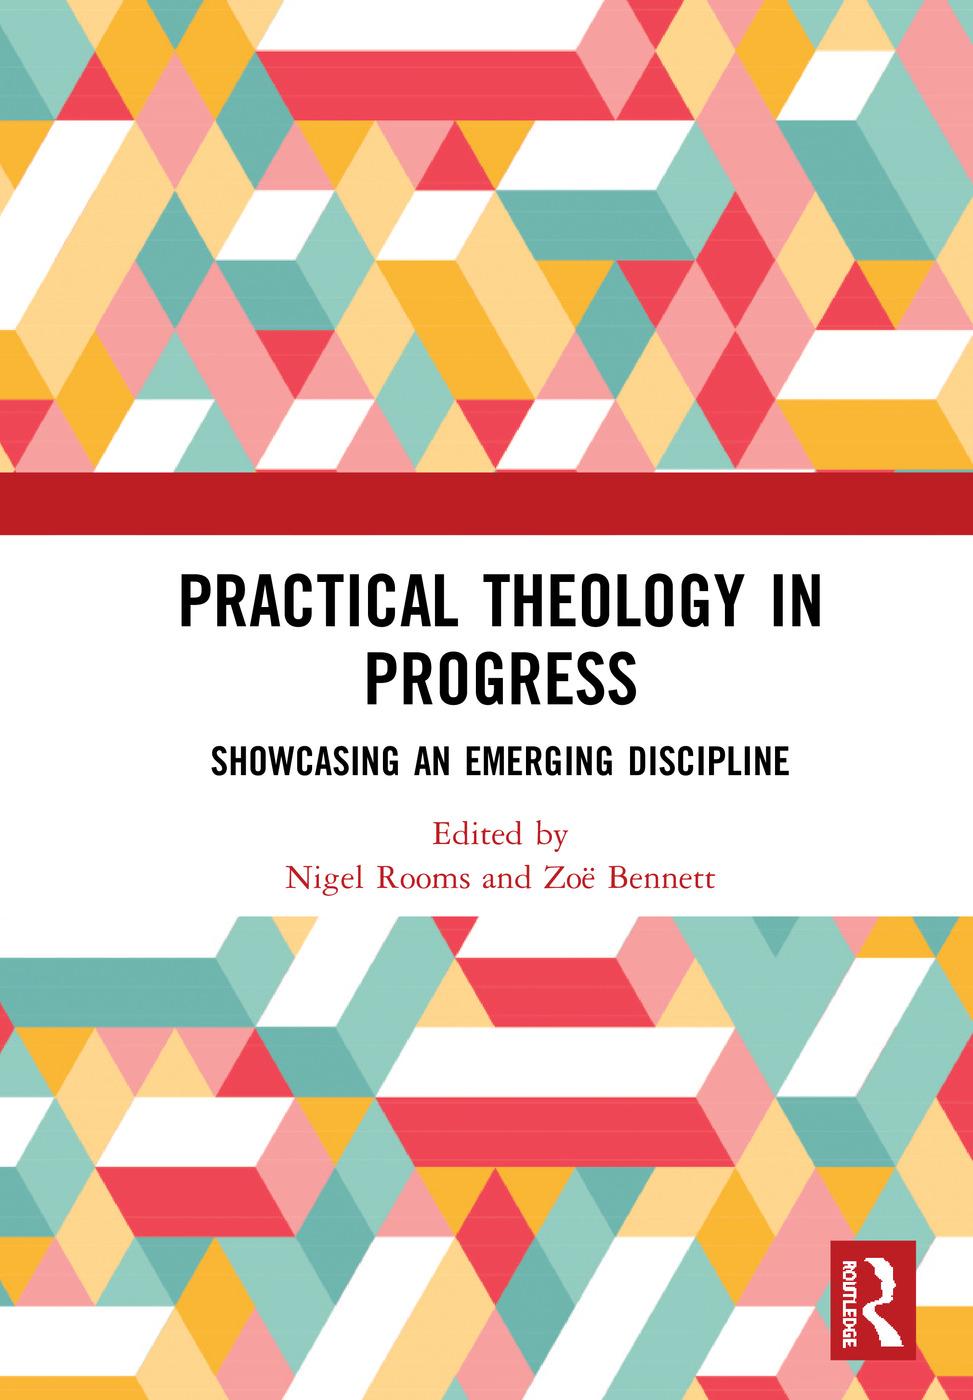 Practical Theology in Progress: Showcasing an emerging discipline book cover